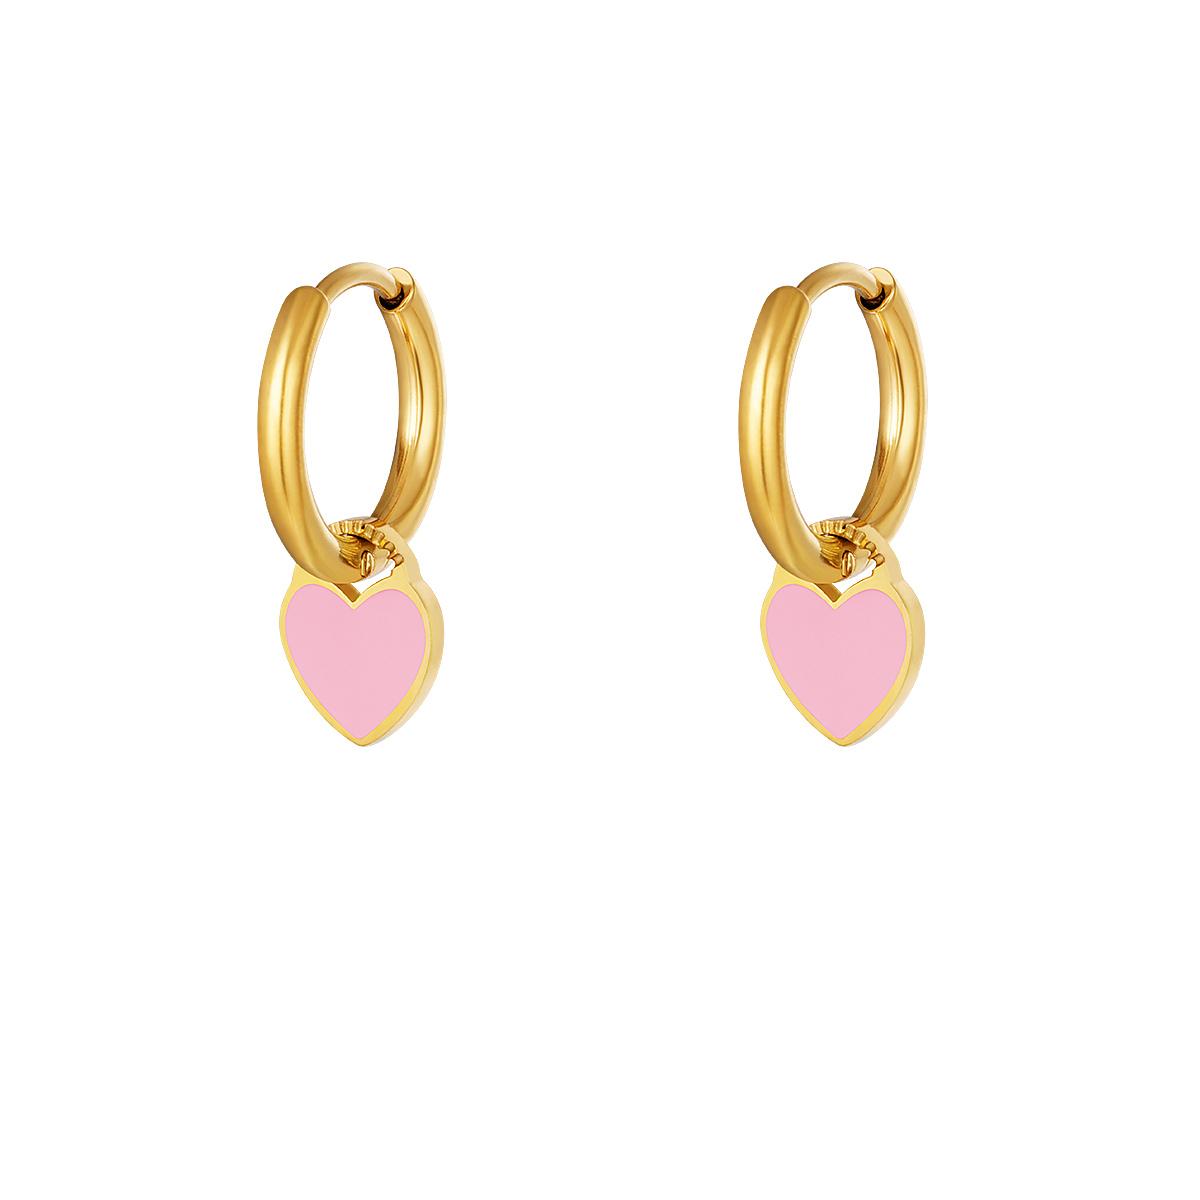 RVS Oorbel Colorful Heart roze gouden oorbellen met roze hartje fashion sieraden kopen bestellen